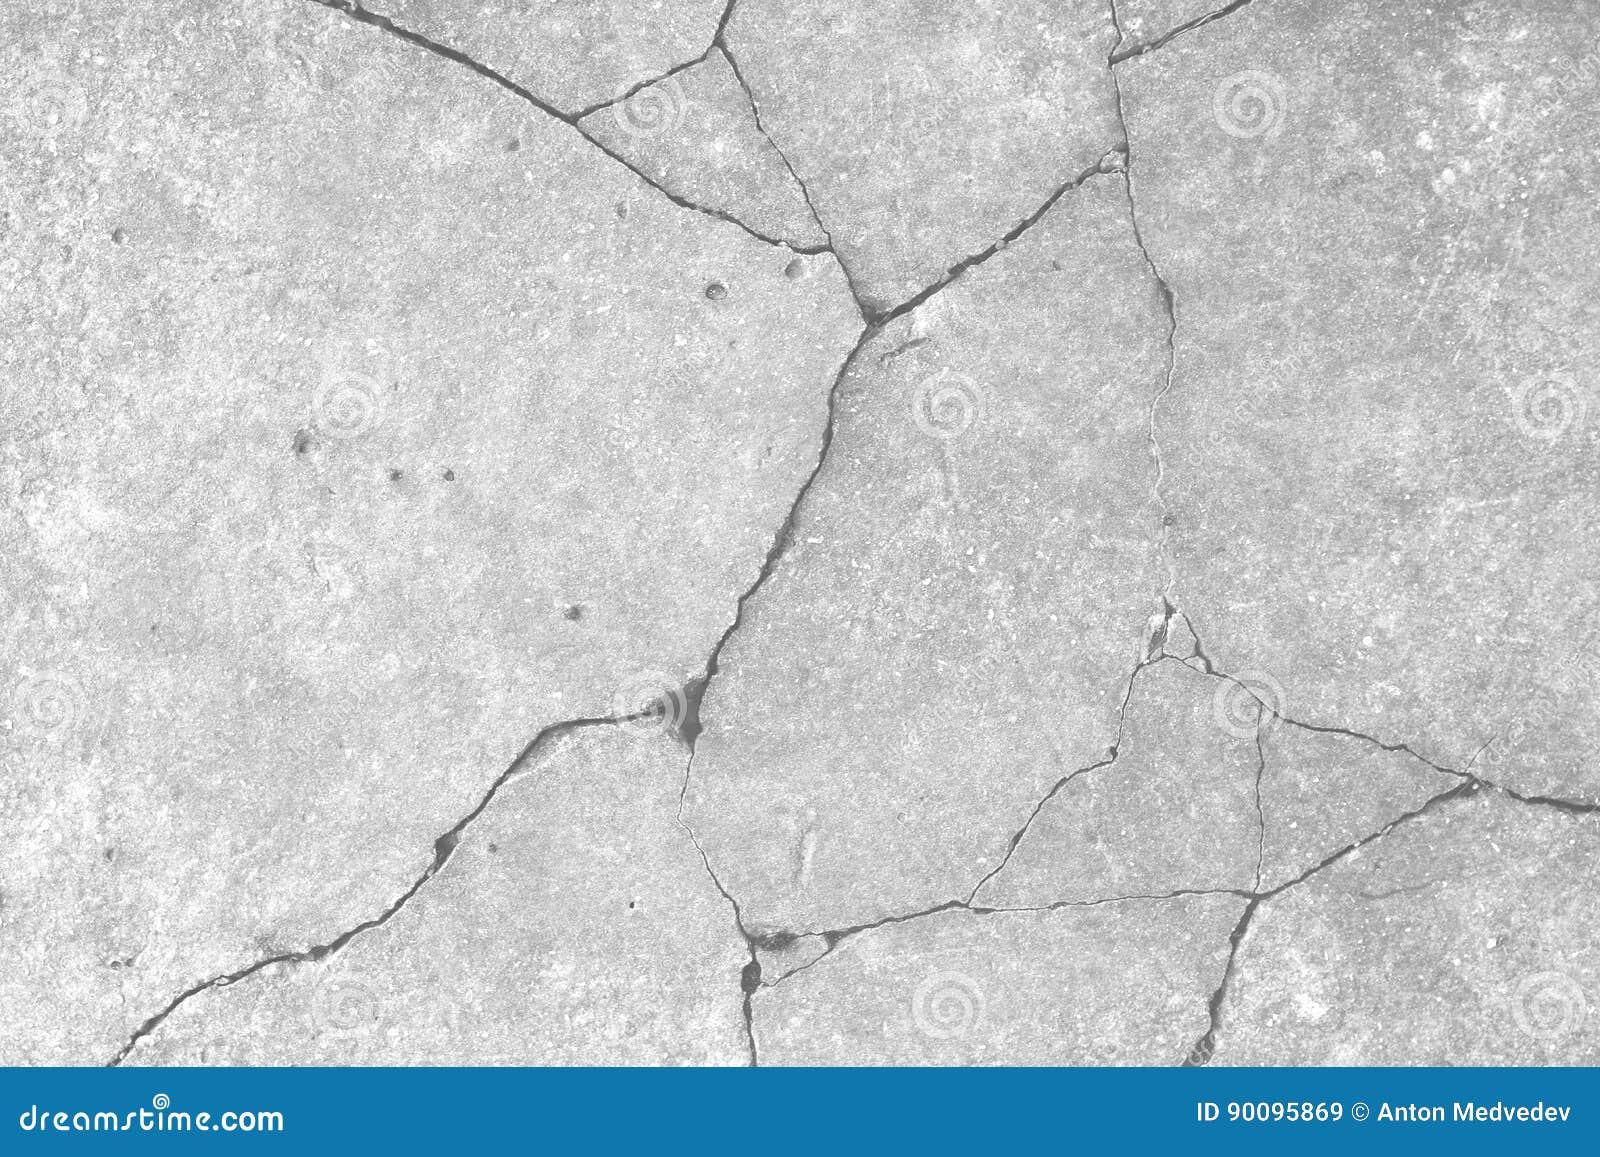 Royalty Free Stock Photo  Download Dark Retro Cracked Concrete Texture. Dark Retro Cracked Concrete Texture Stock Photo   Image  90095869